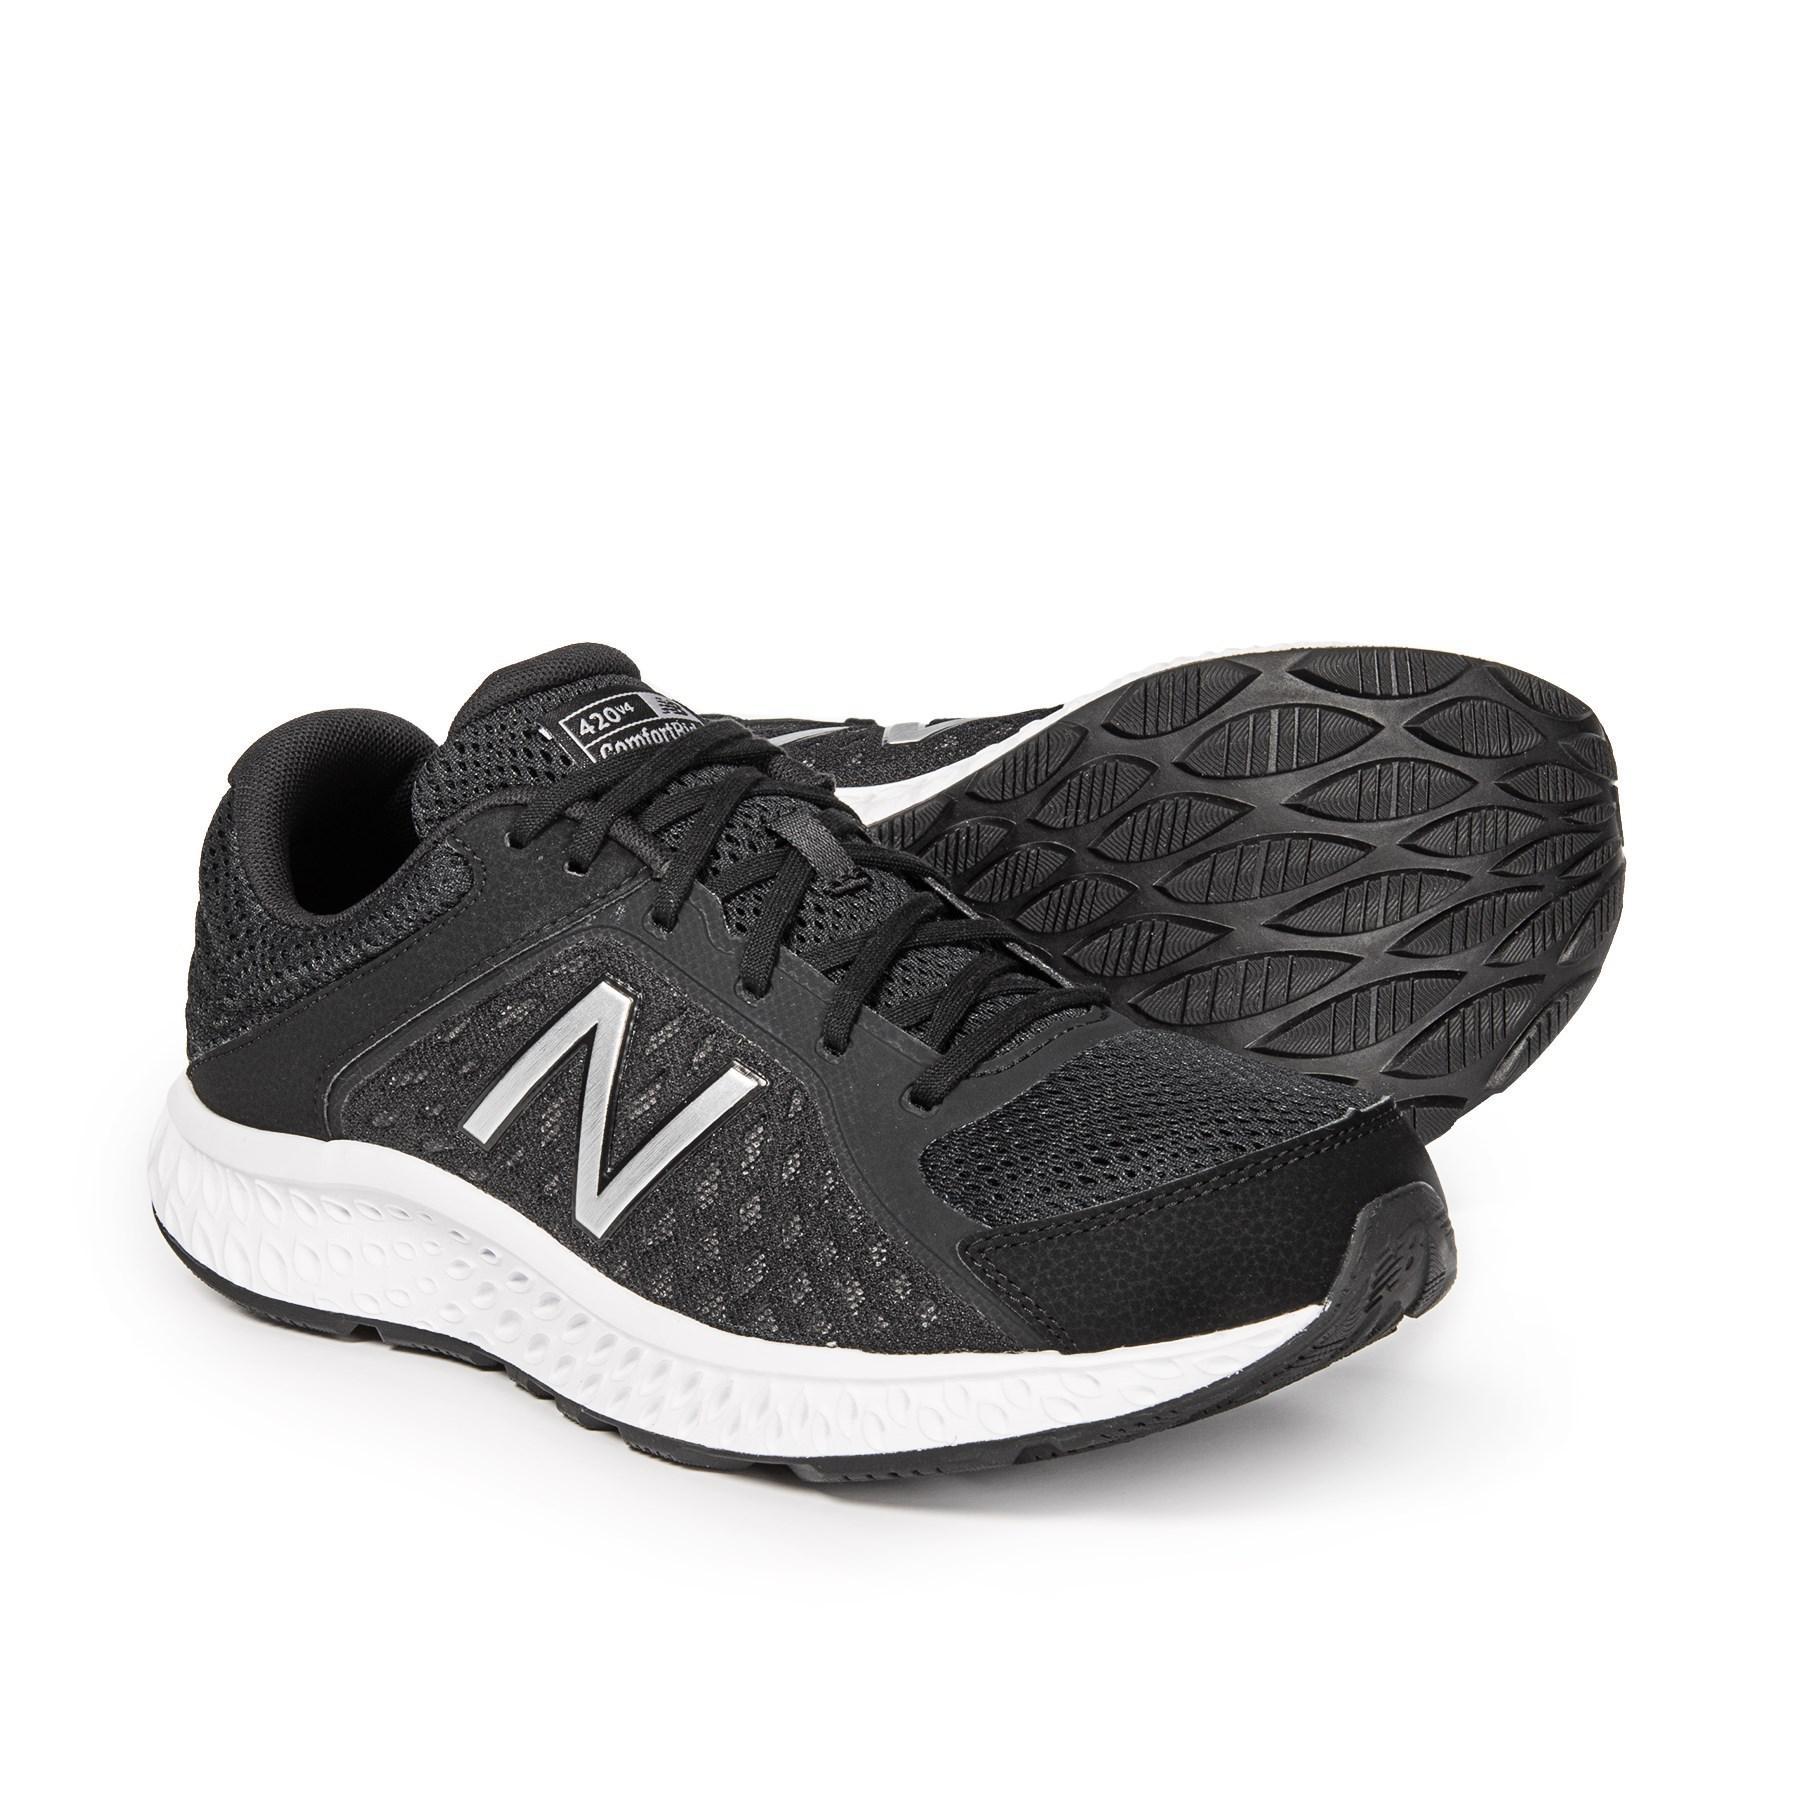 187aa771f Lyst - New Balance 420v4 Running Shoes (for Men) in Black for Men